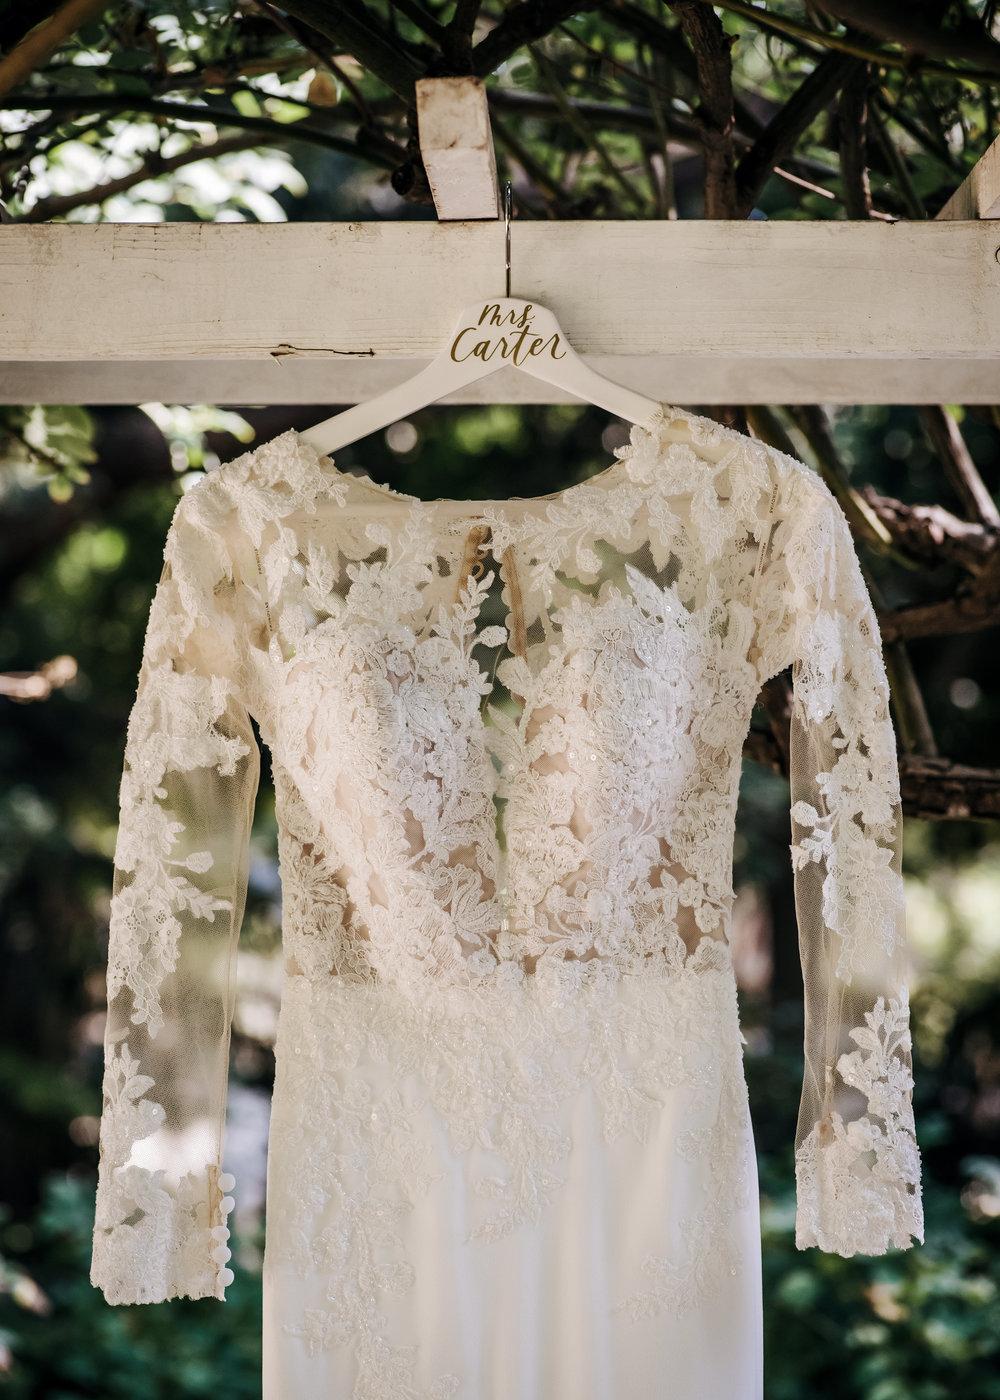 Turchin_20180825_Austinae-Brent-Wedding_049.jpg